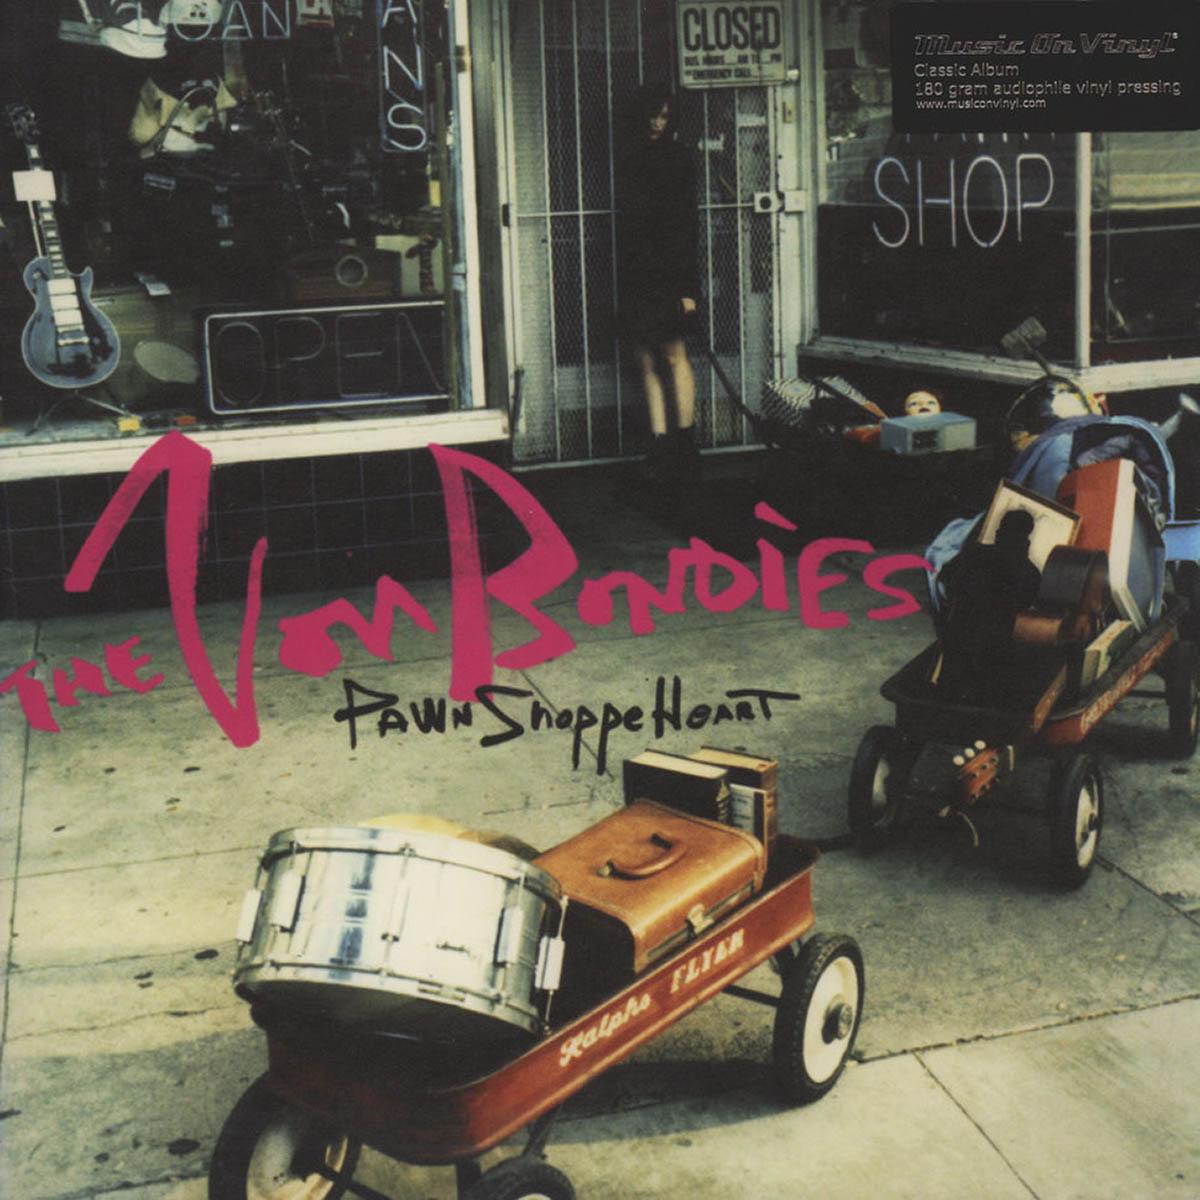 The Von Bondies, Pawn Shoppe Heart